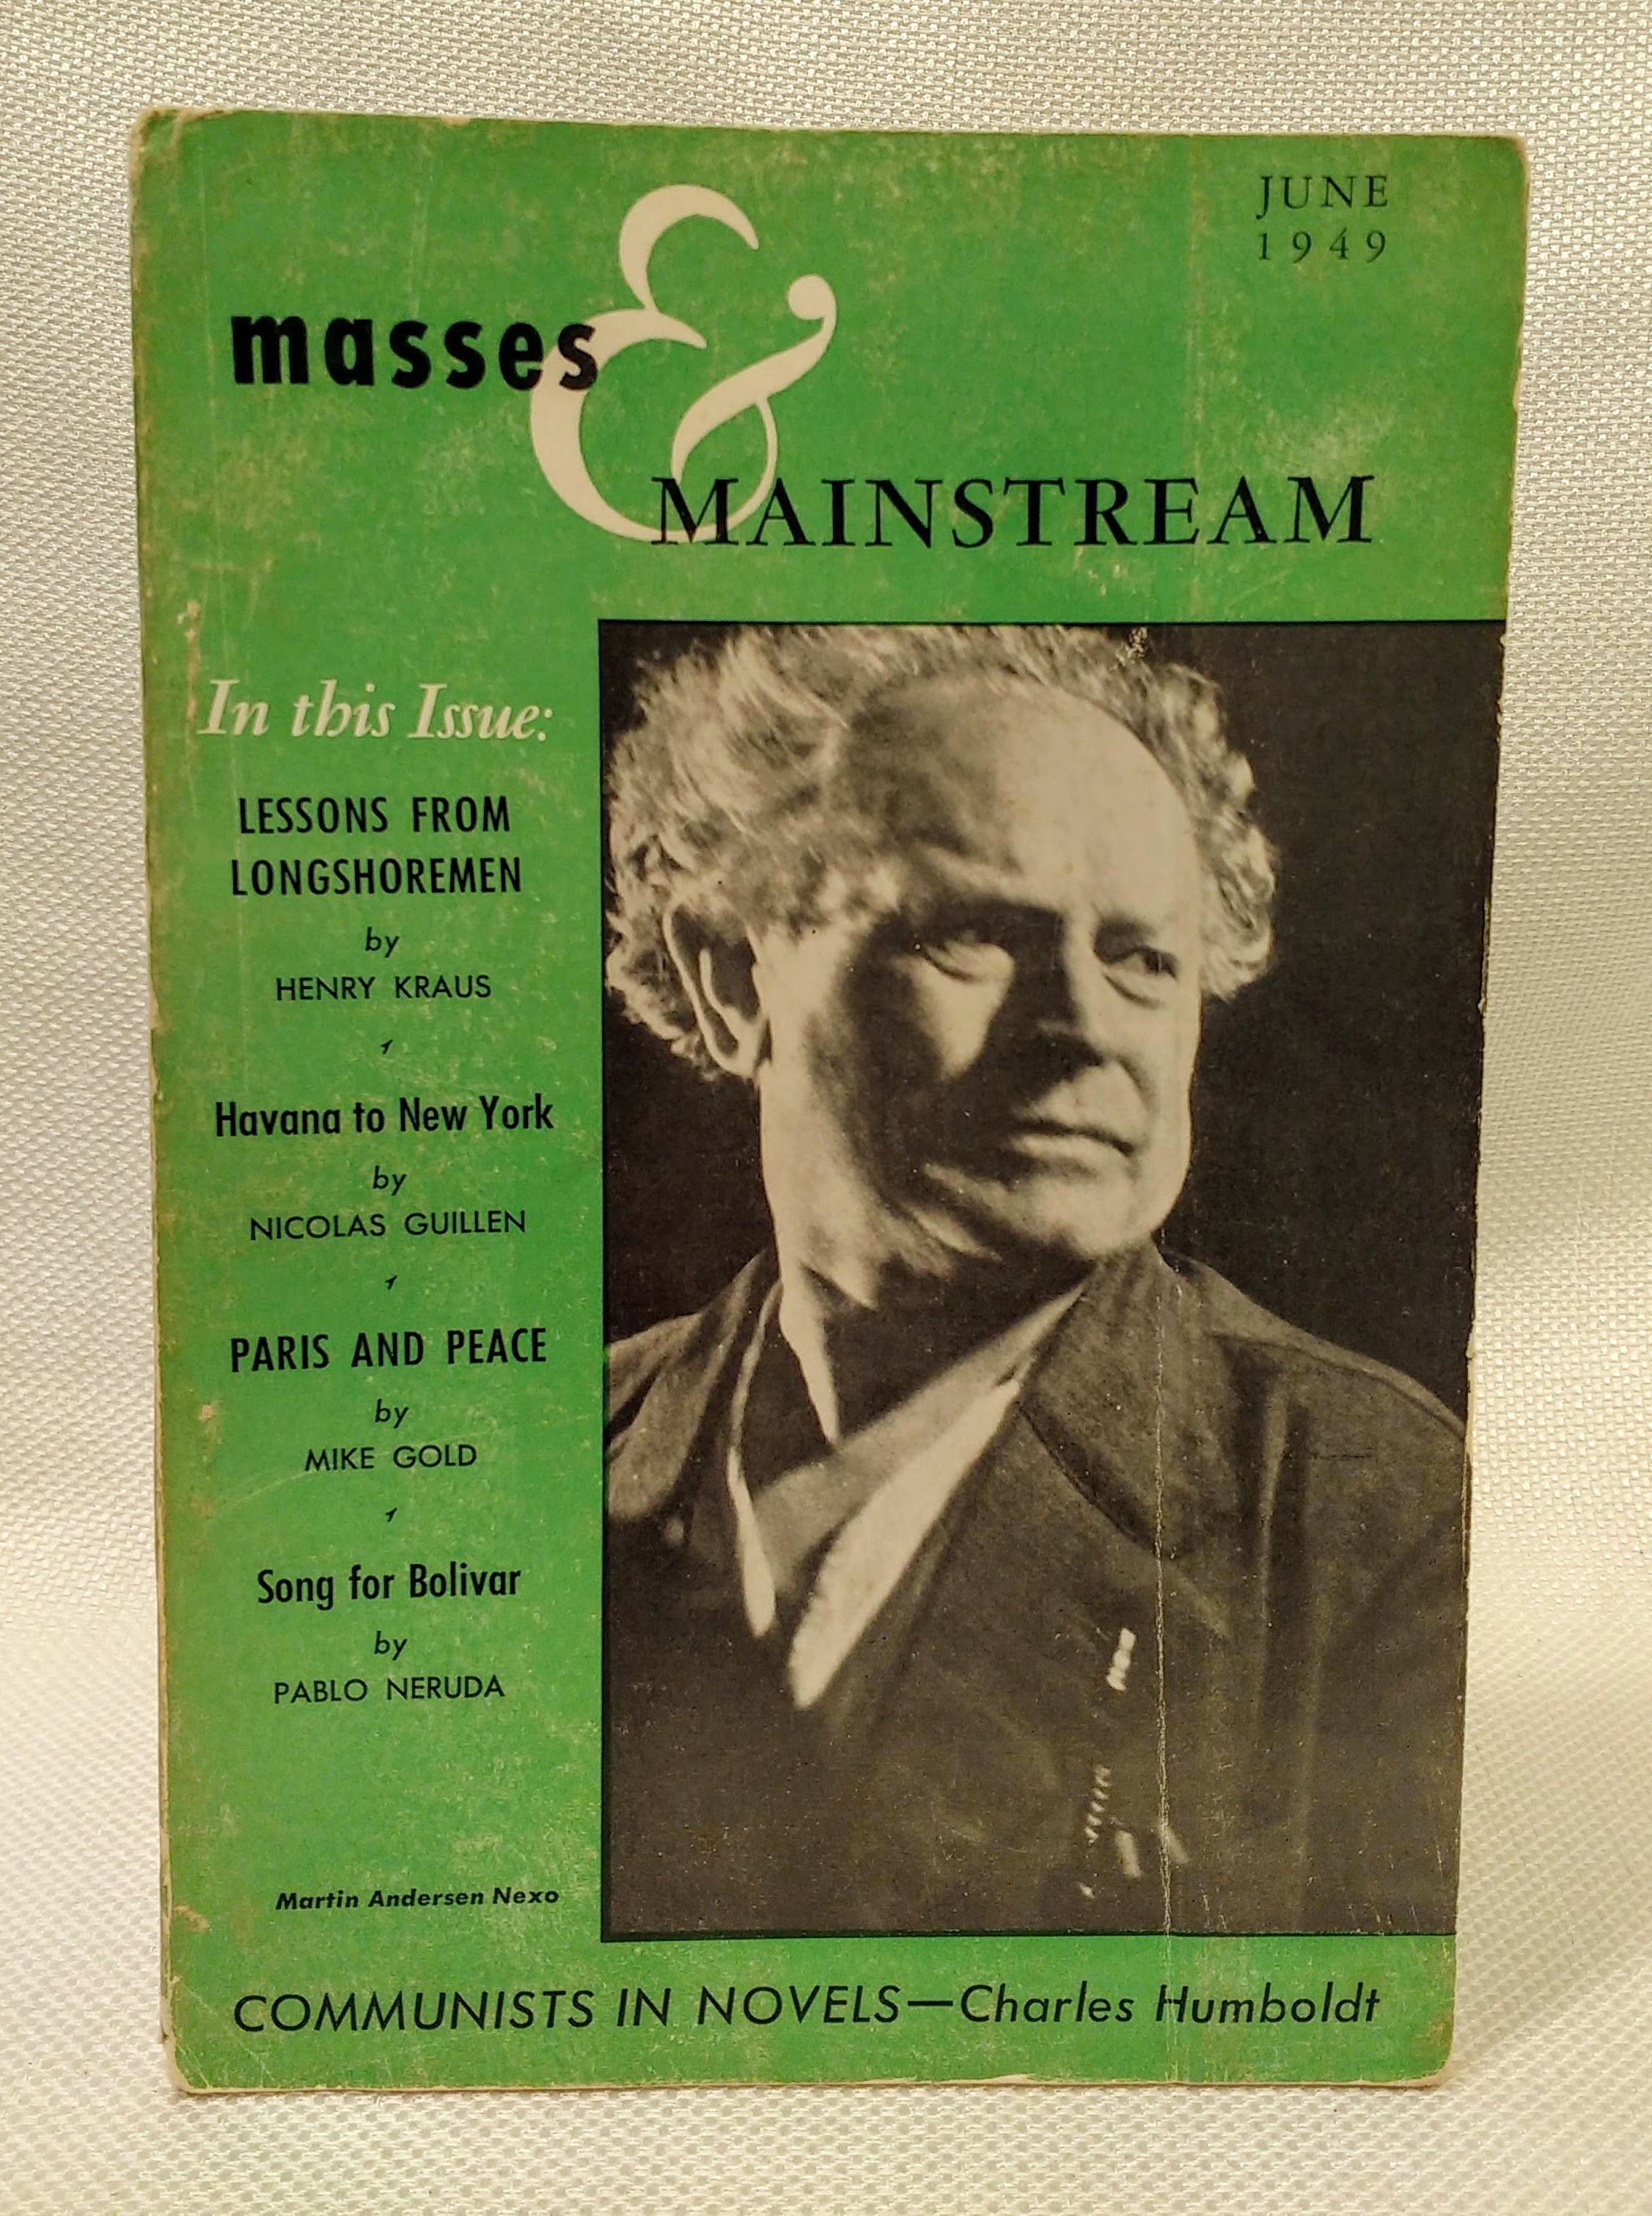 Masses & Mainstream; Vol. 2, No. 6 (June 1949), Sillen, Samuel [ed.]; Aptheker, Herbert [Assoc. Editor]; Brown, Lloyd [Assoc. Editor]; Humboldt, Charles [Assoc. Editor]